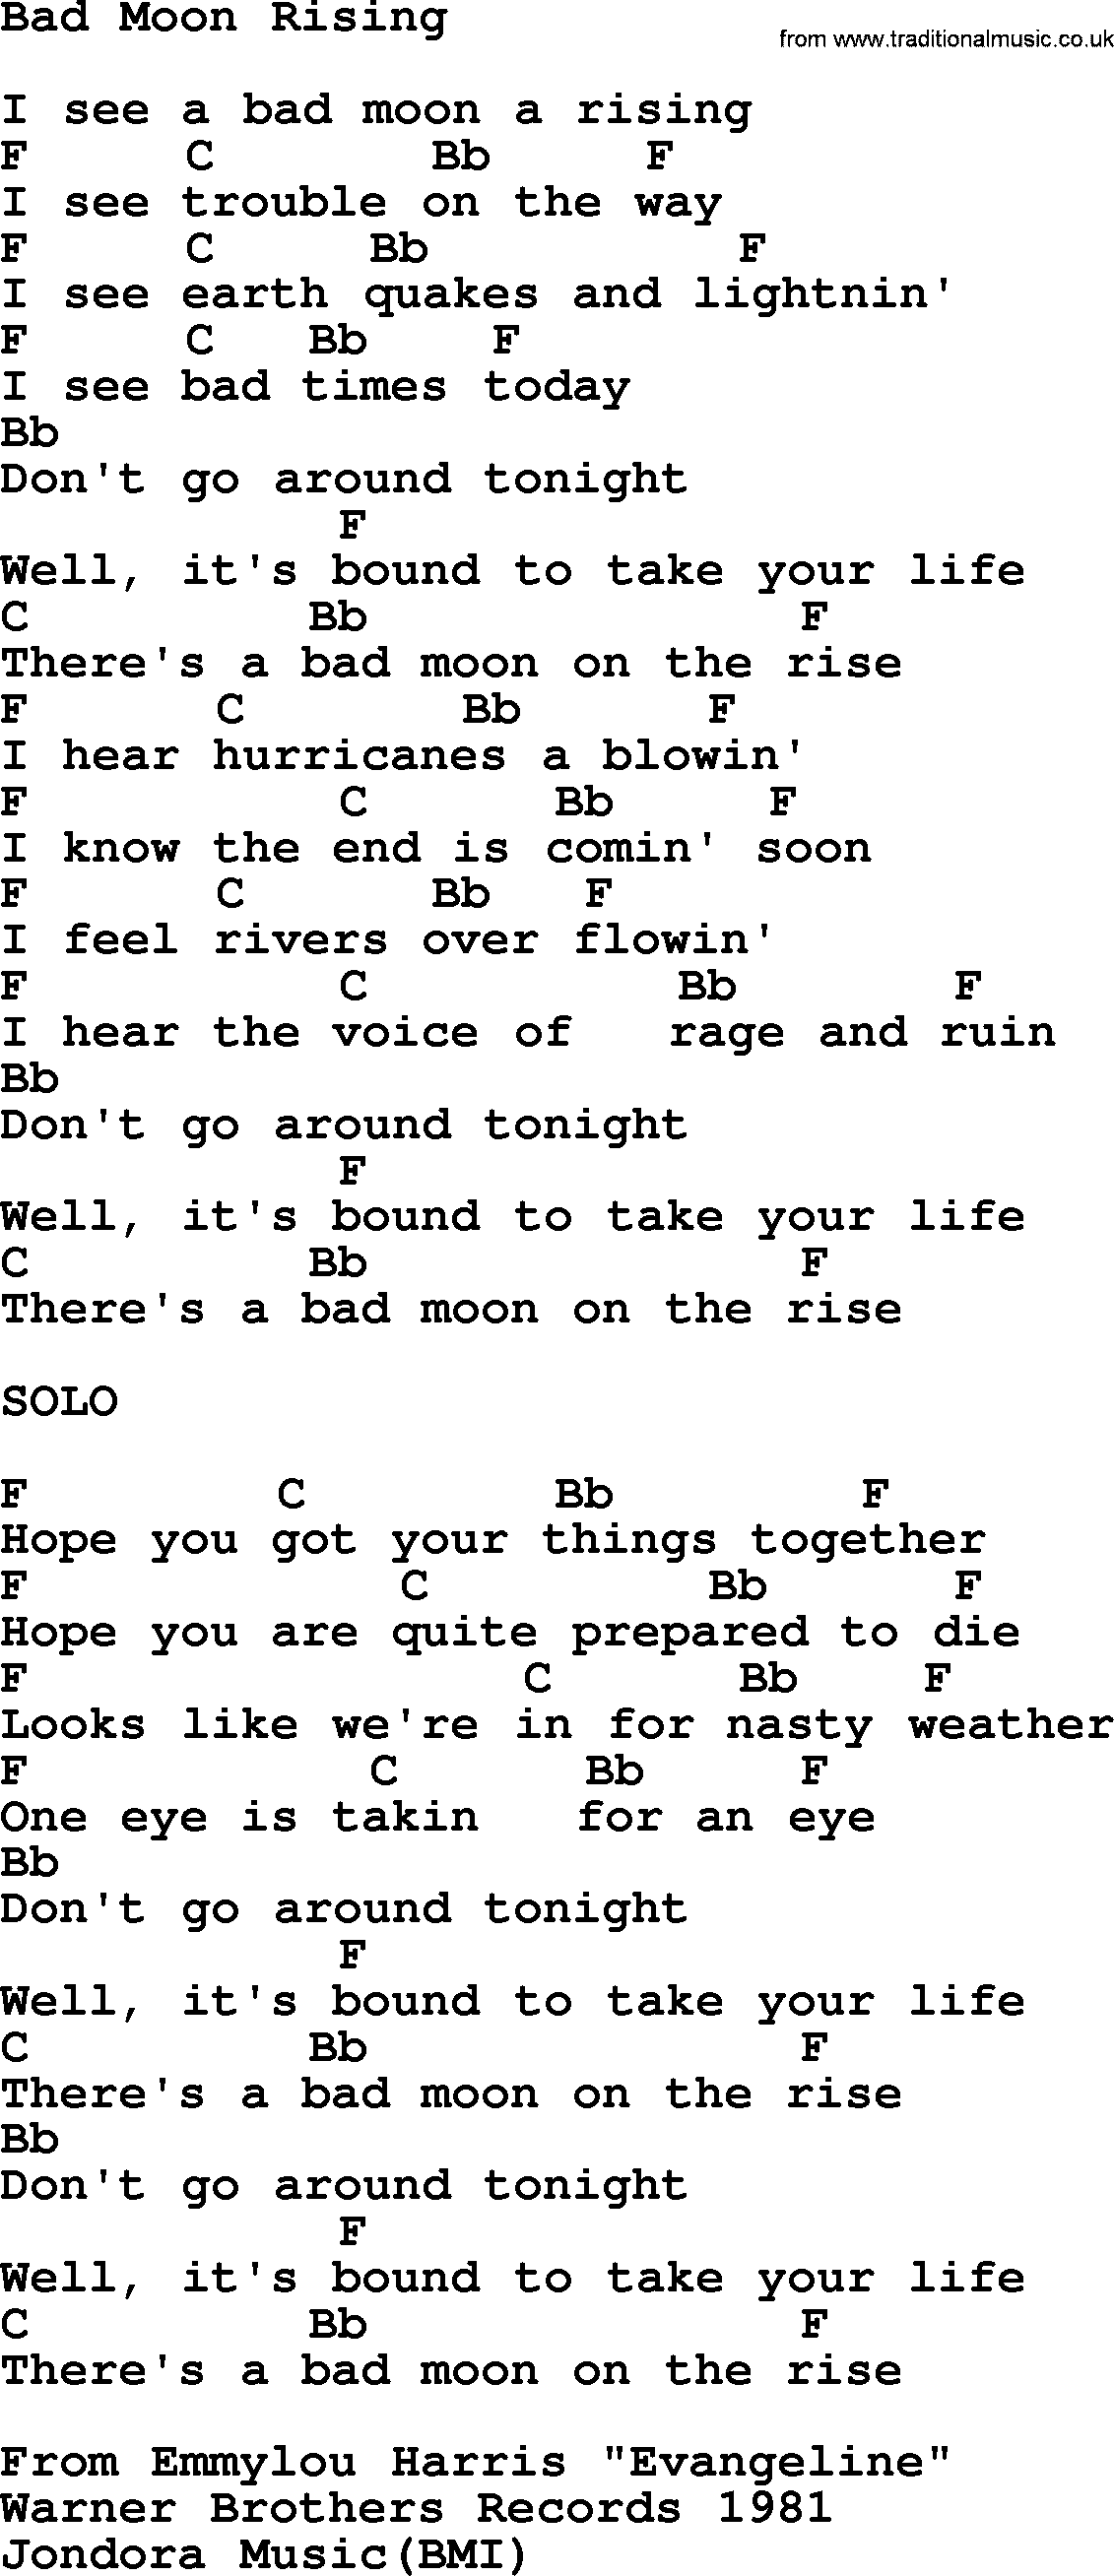 Emmylou Harris Song Bad Moon Rising Lyrics And Chords Songs